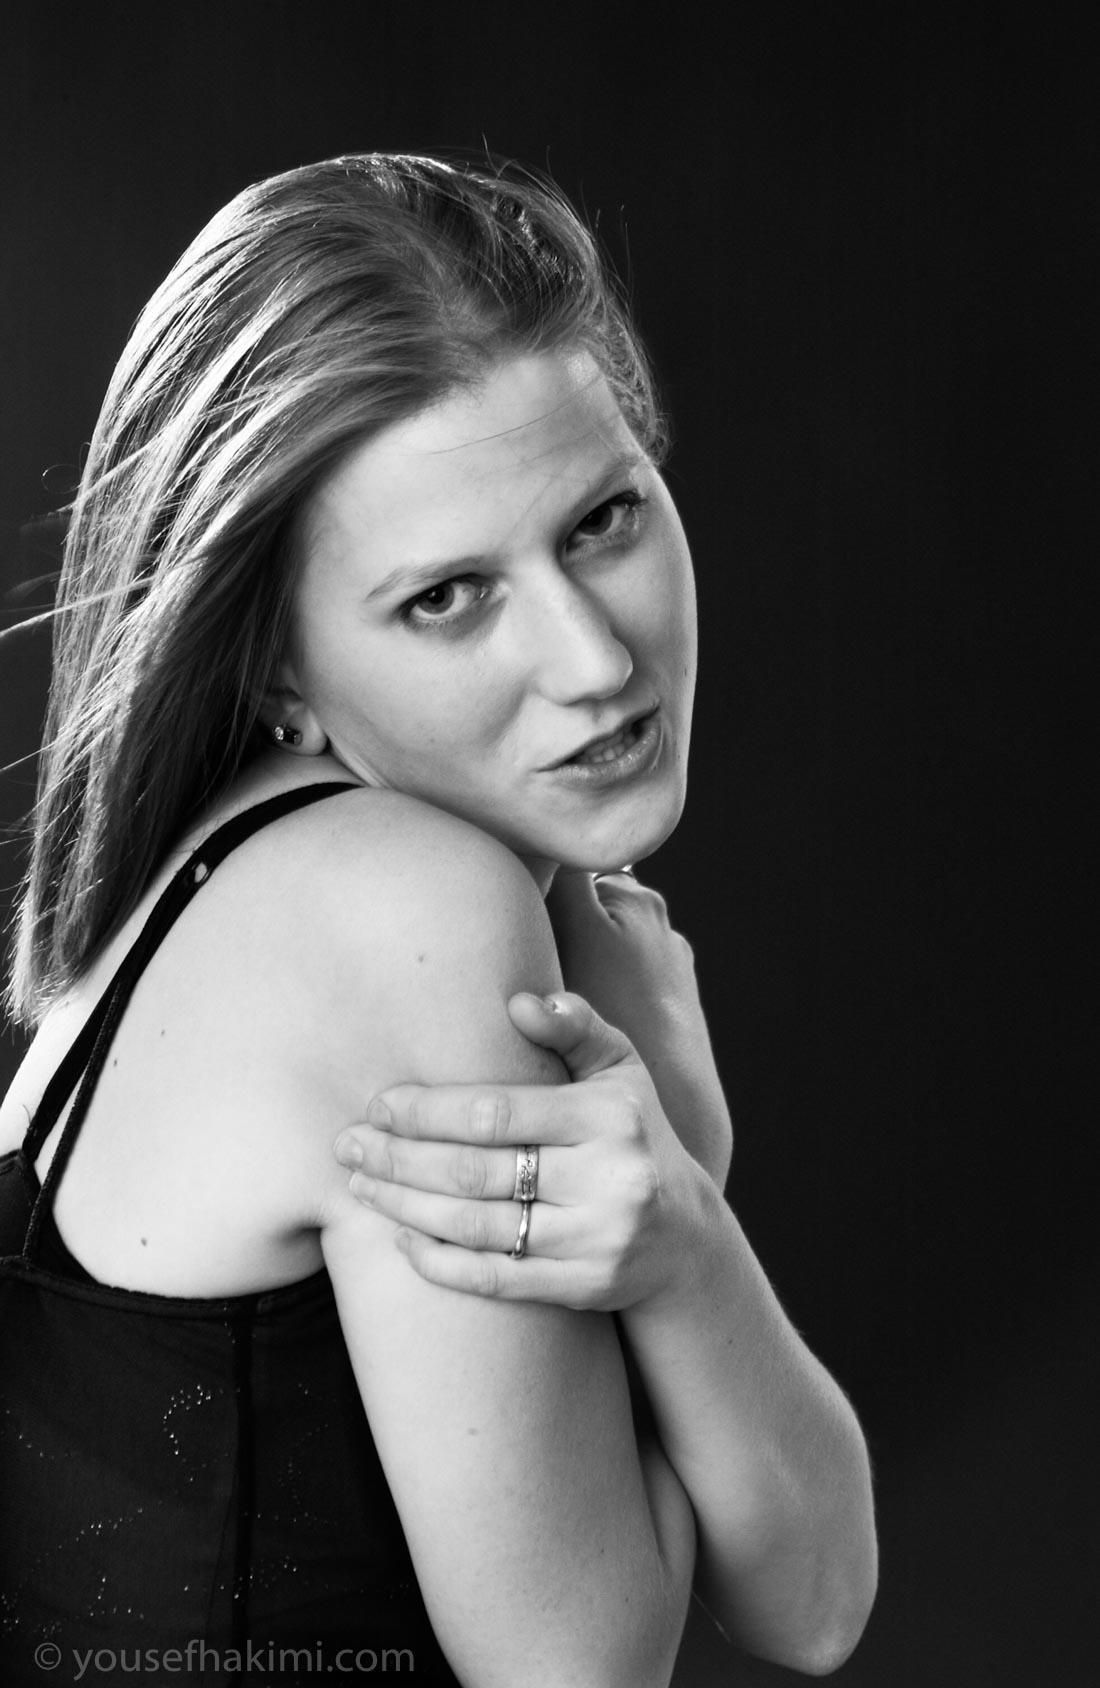 Starportrait, Model, Beauty, Fotostudio Yaph Yousef A. P. Hakimi Photography